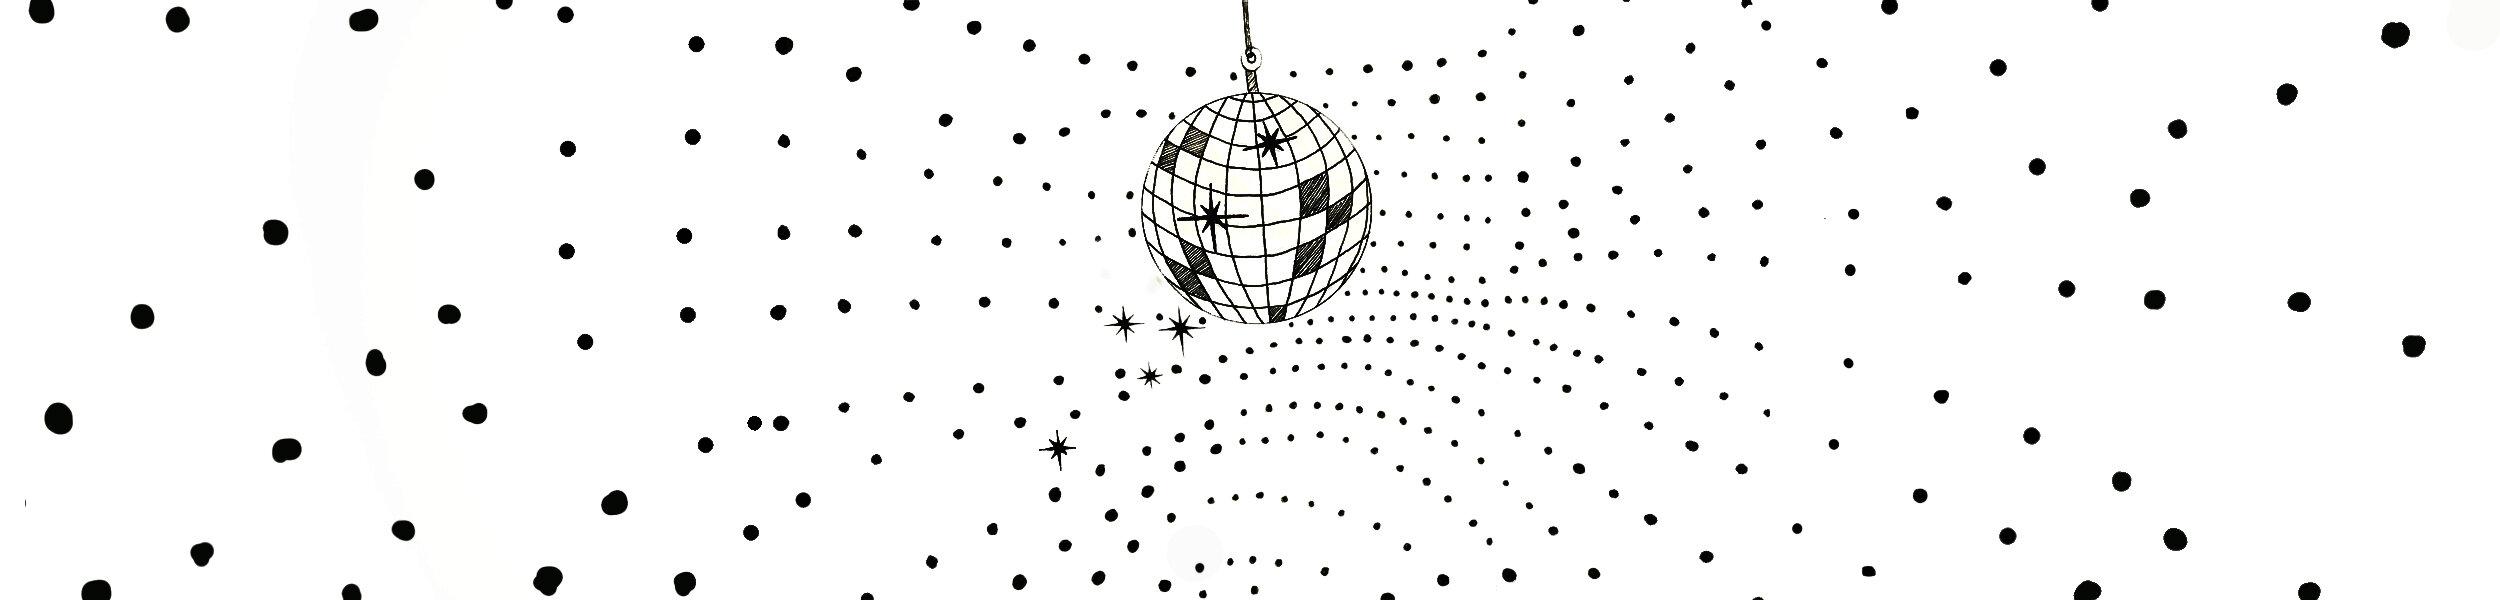 disco-ball-banner.jpg